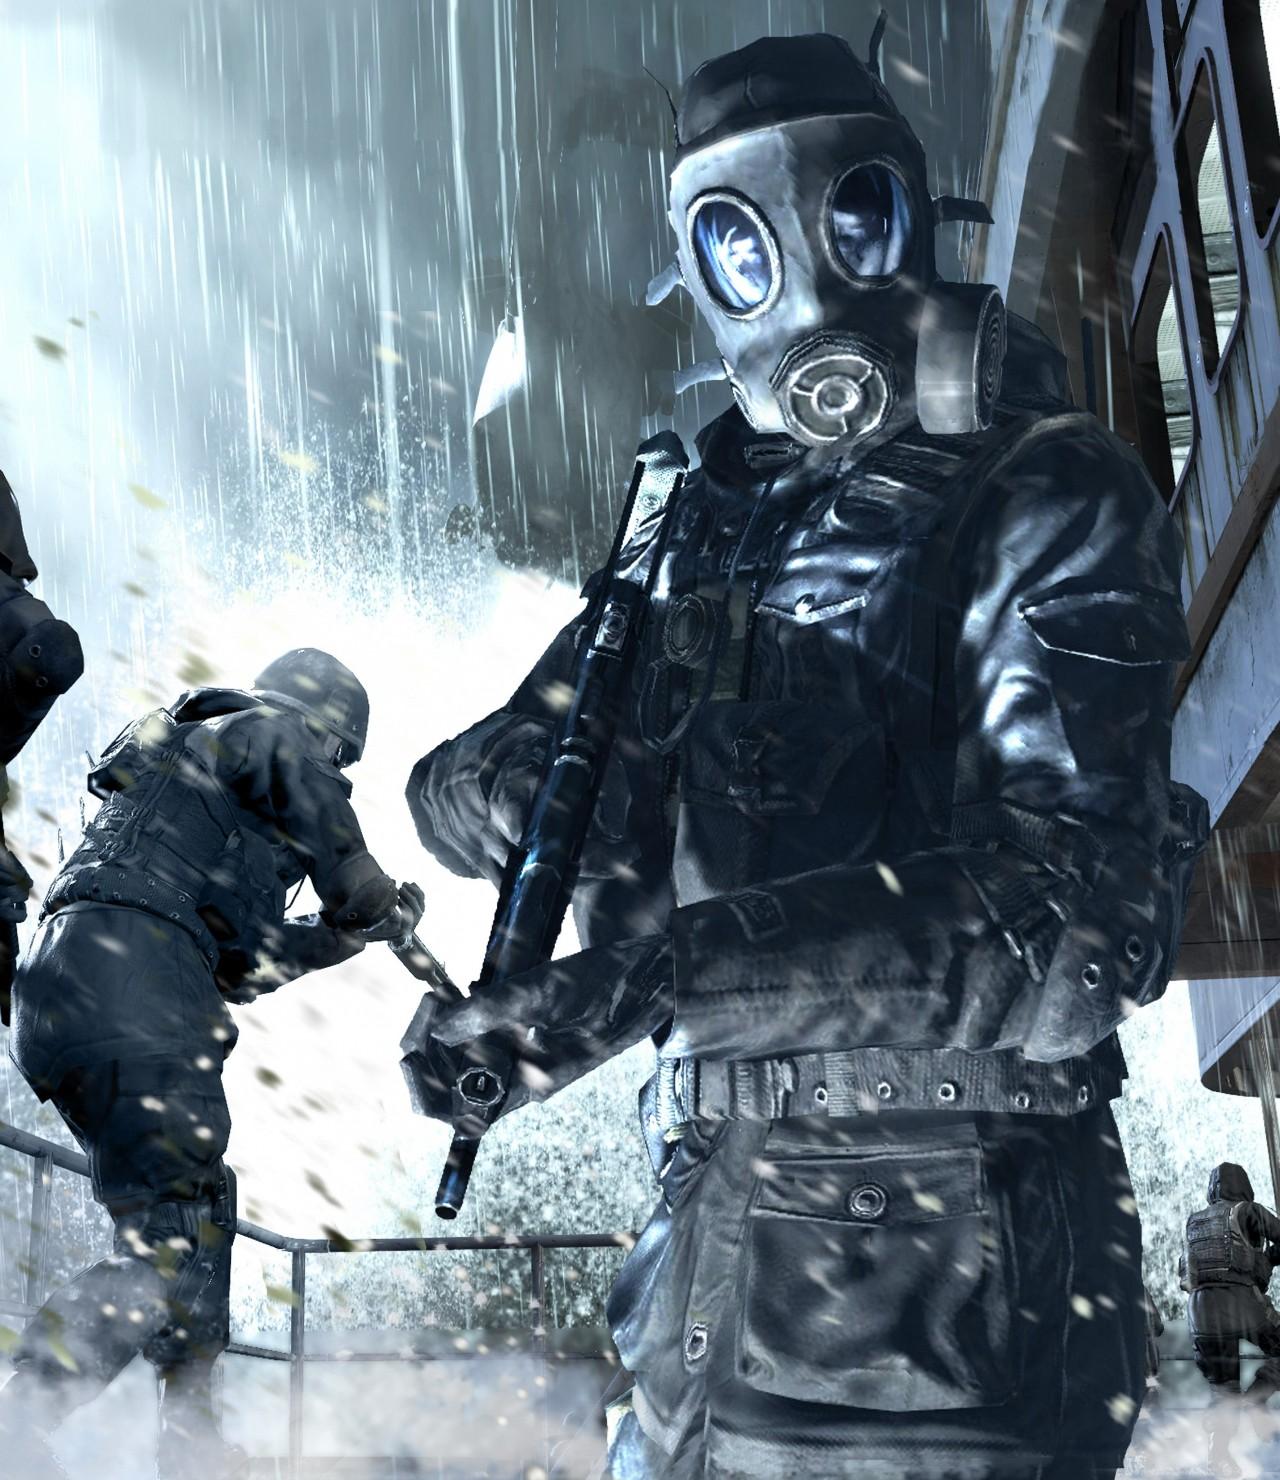 NODVD для игры Call of Duty 4 Modern Warfare 2 Продолжение.